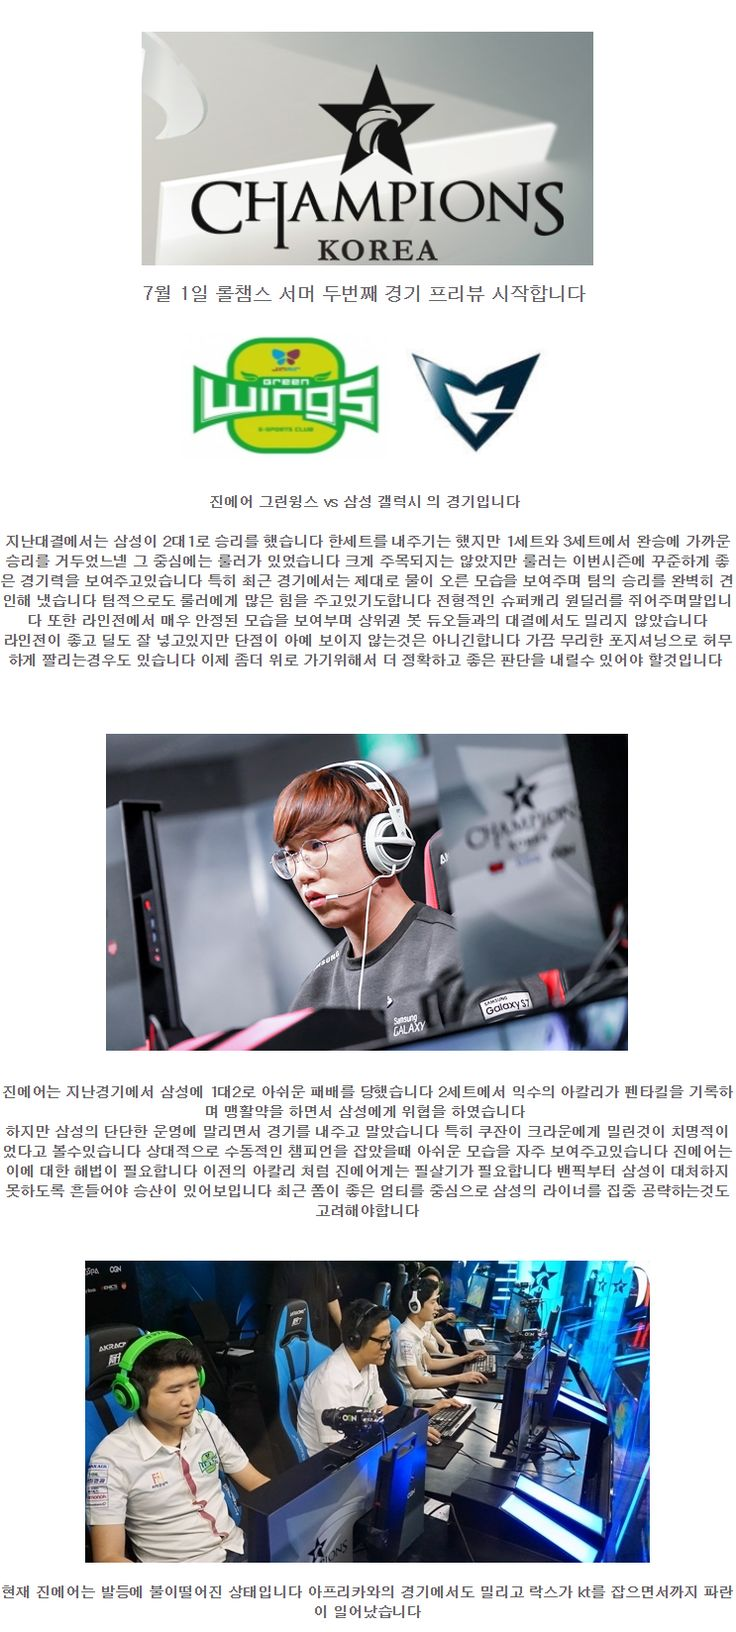 [LCK summer 시즌] 7월 01일 롤 분석픽 진에어 VS 삼성 ★토토군  무료분석픽★